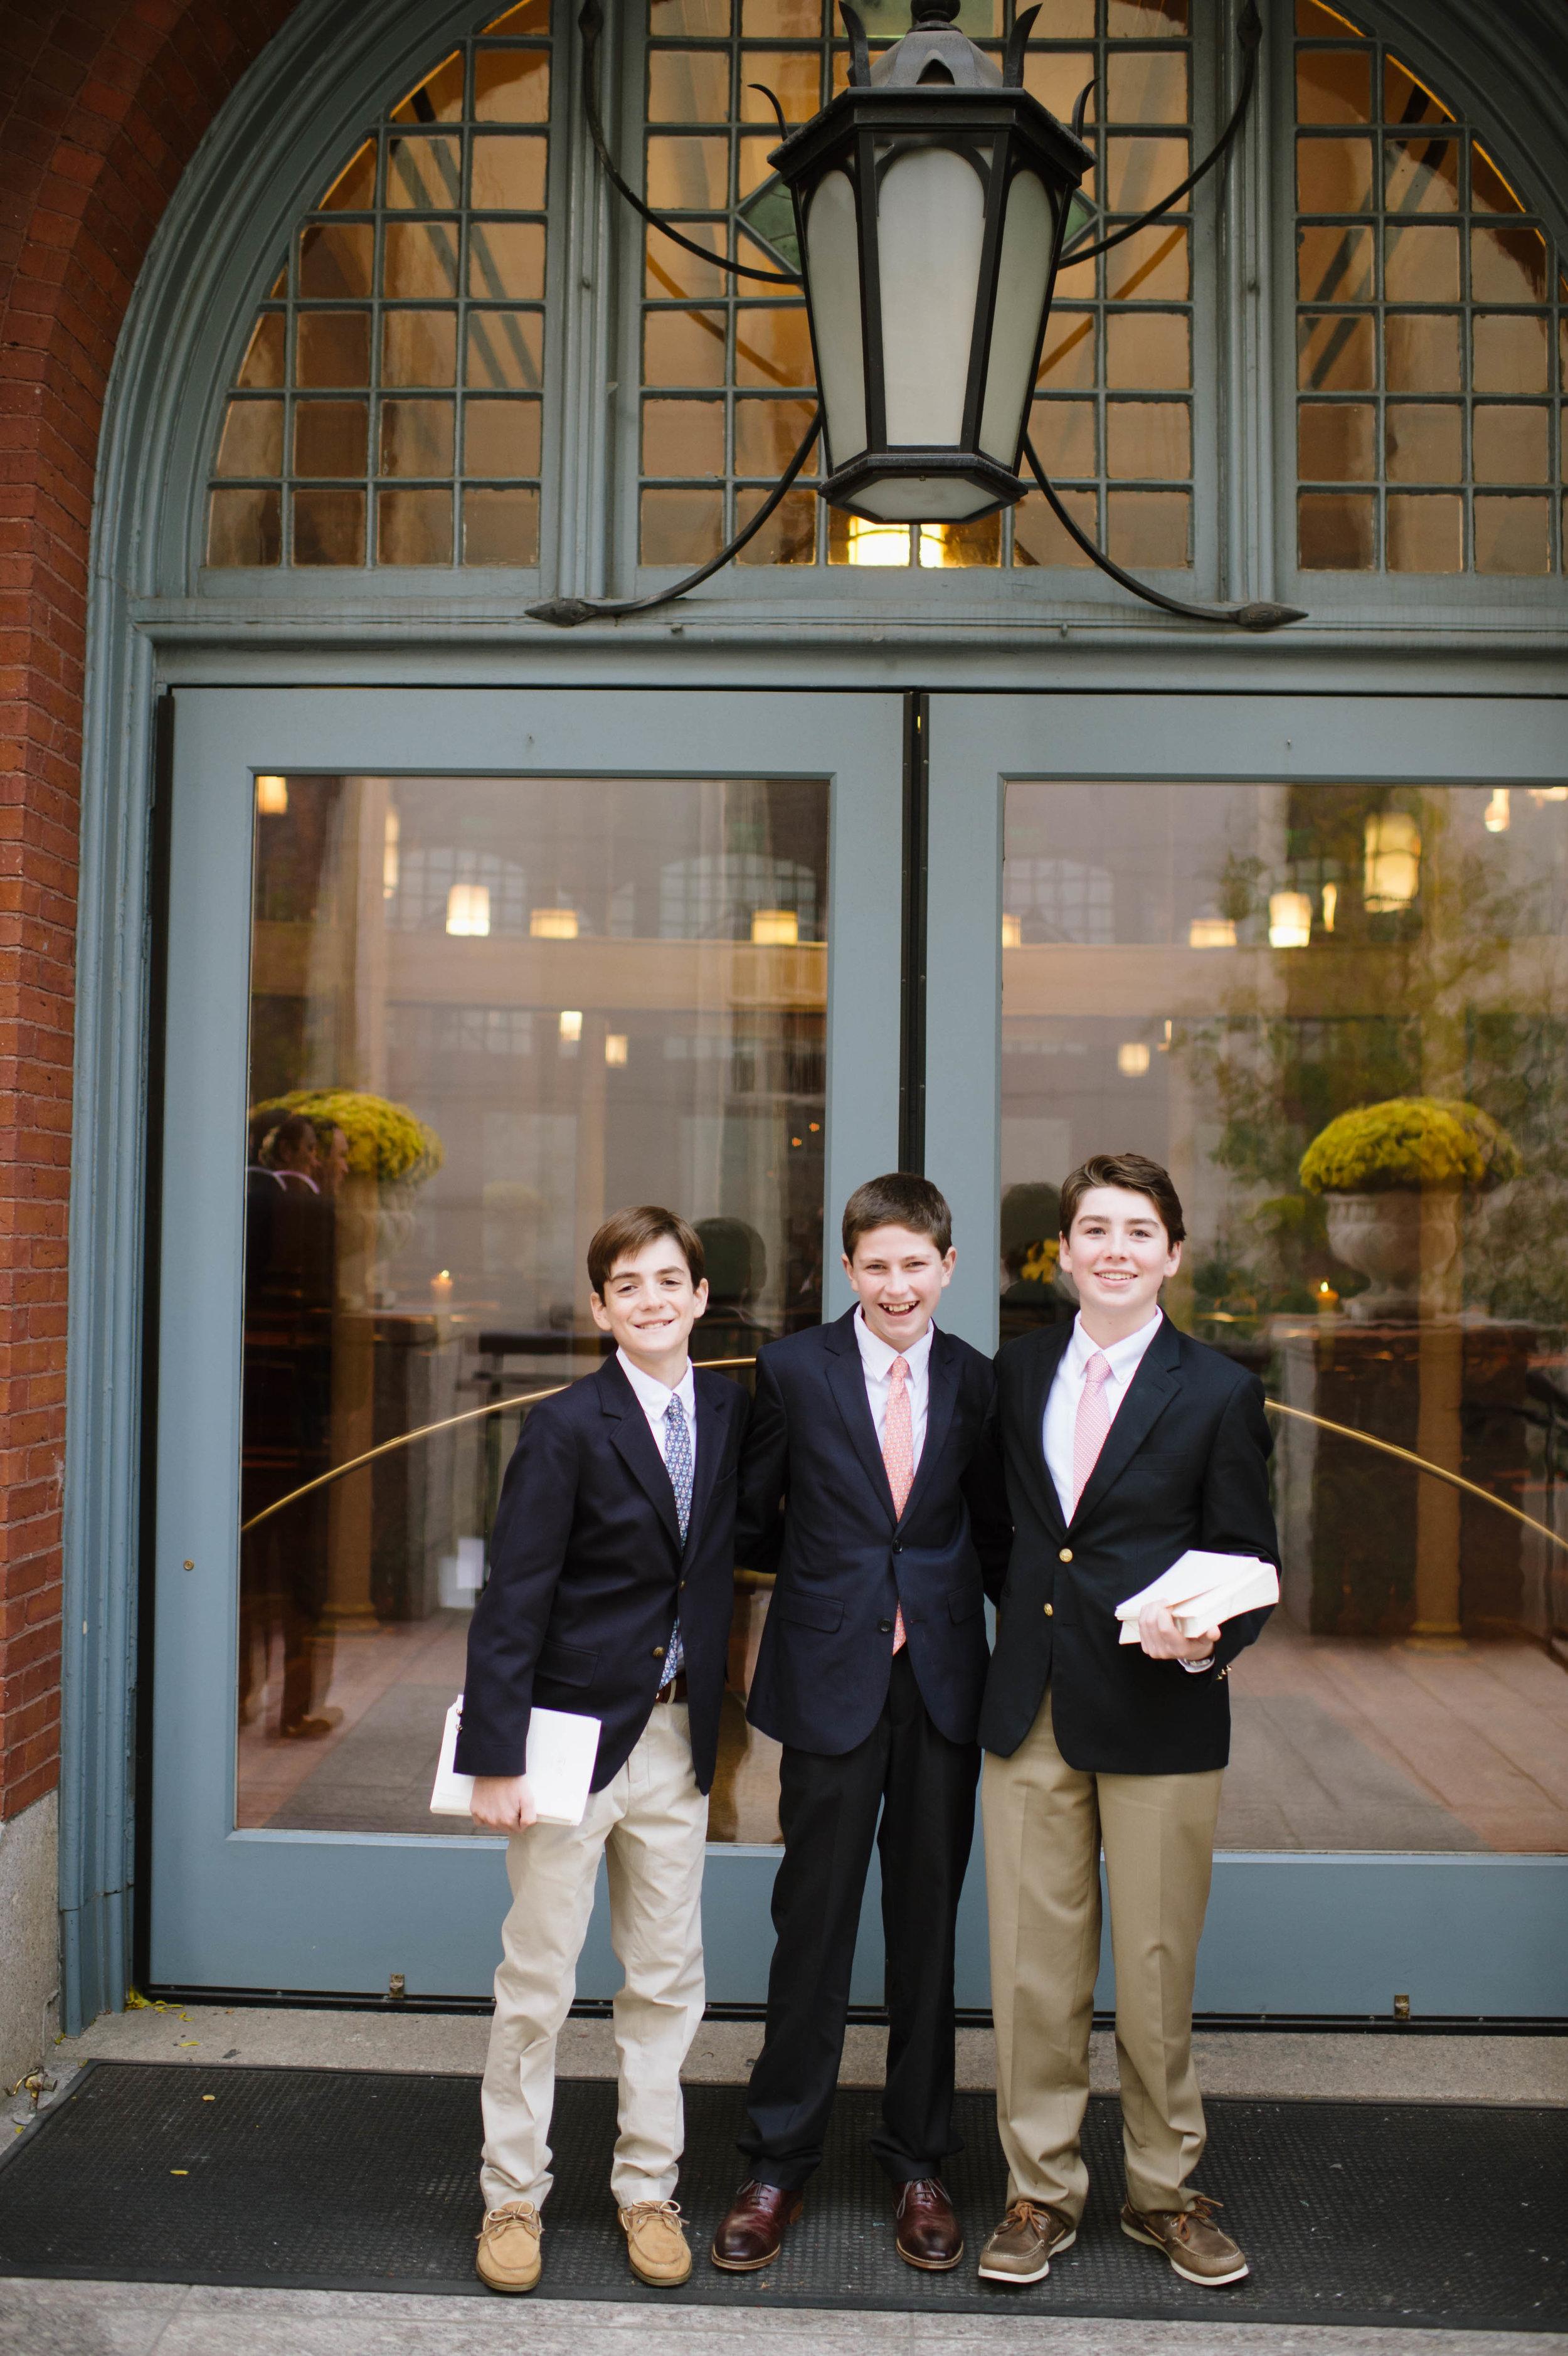 Creative-Wedding-Photography-Boston30.jpg